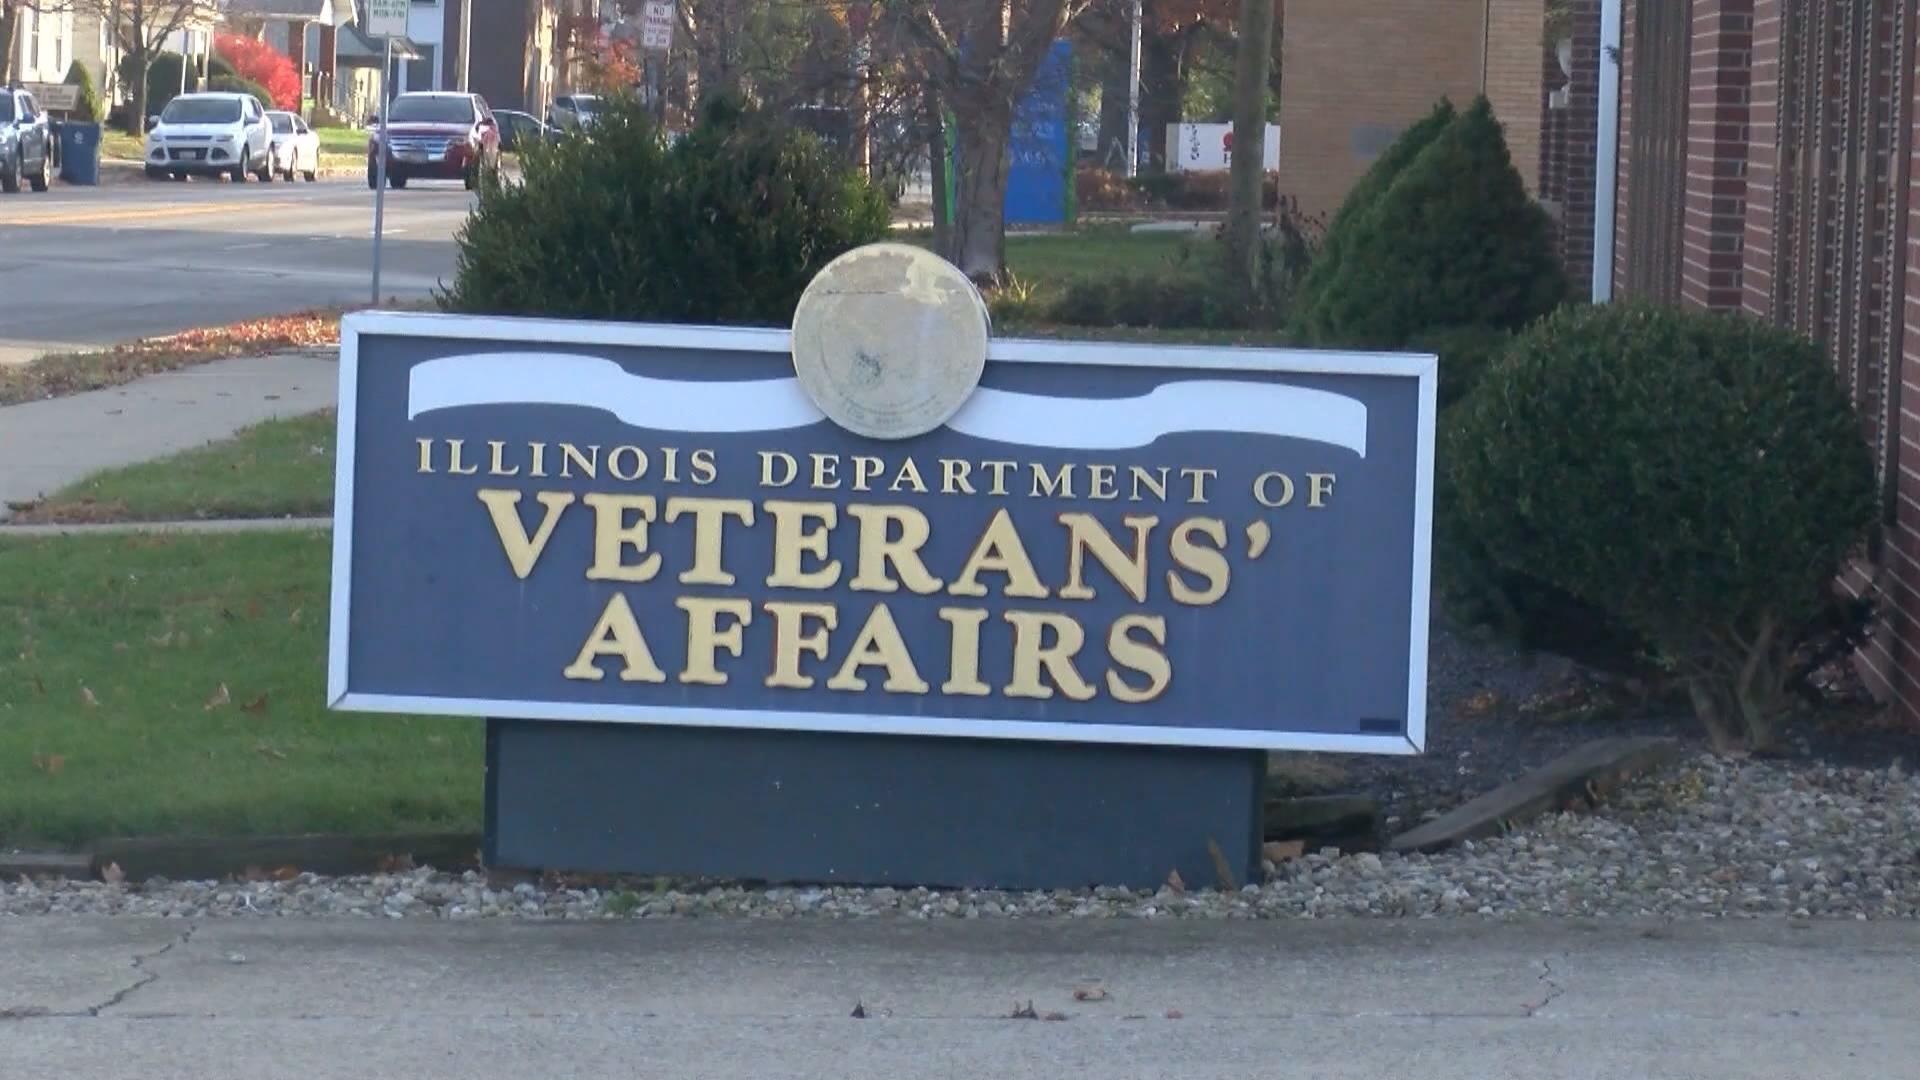 veterans affairs_1510958363566.jpg